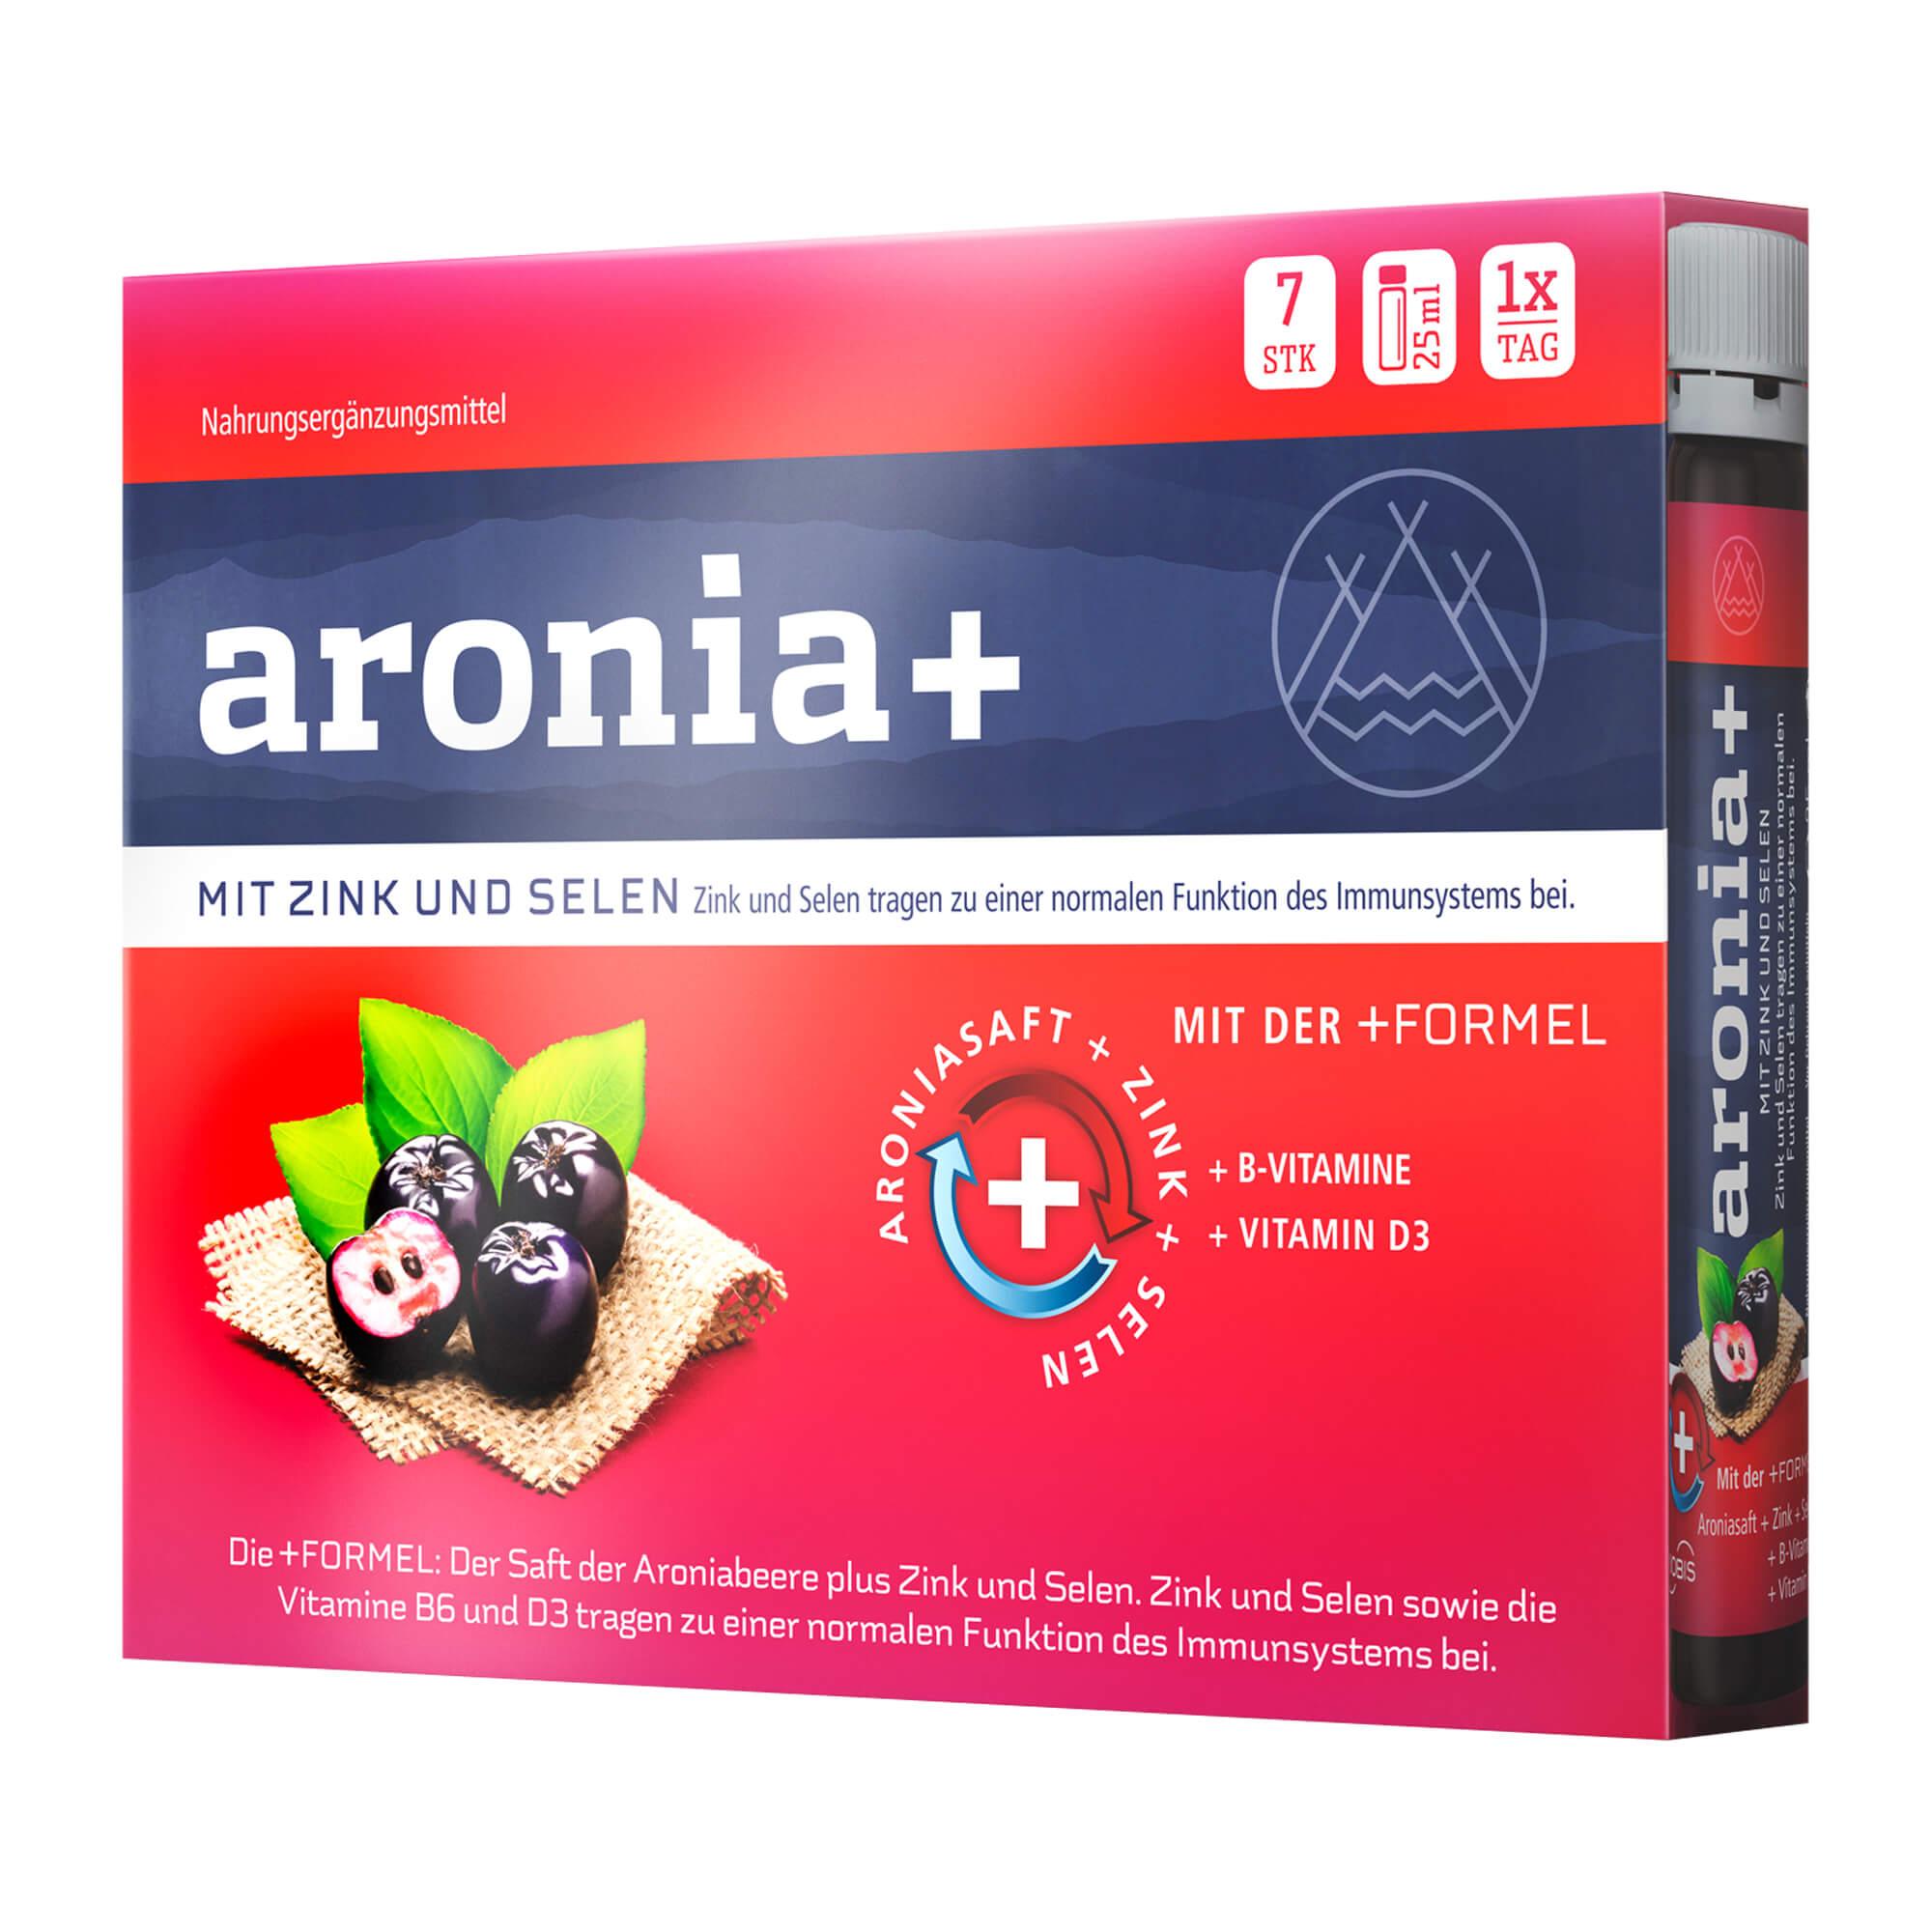 Aronia+ Immun